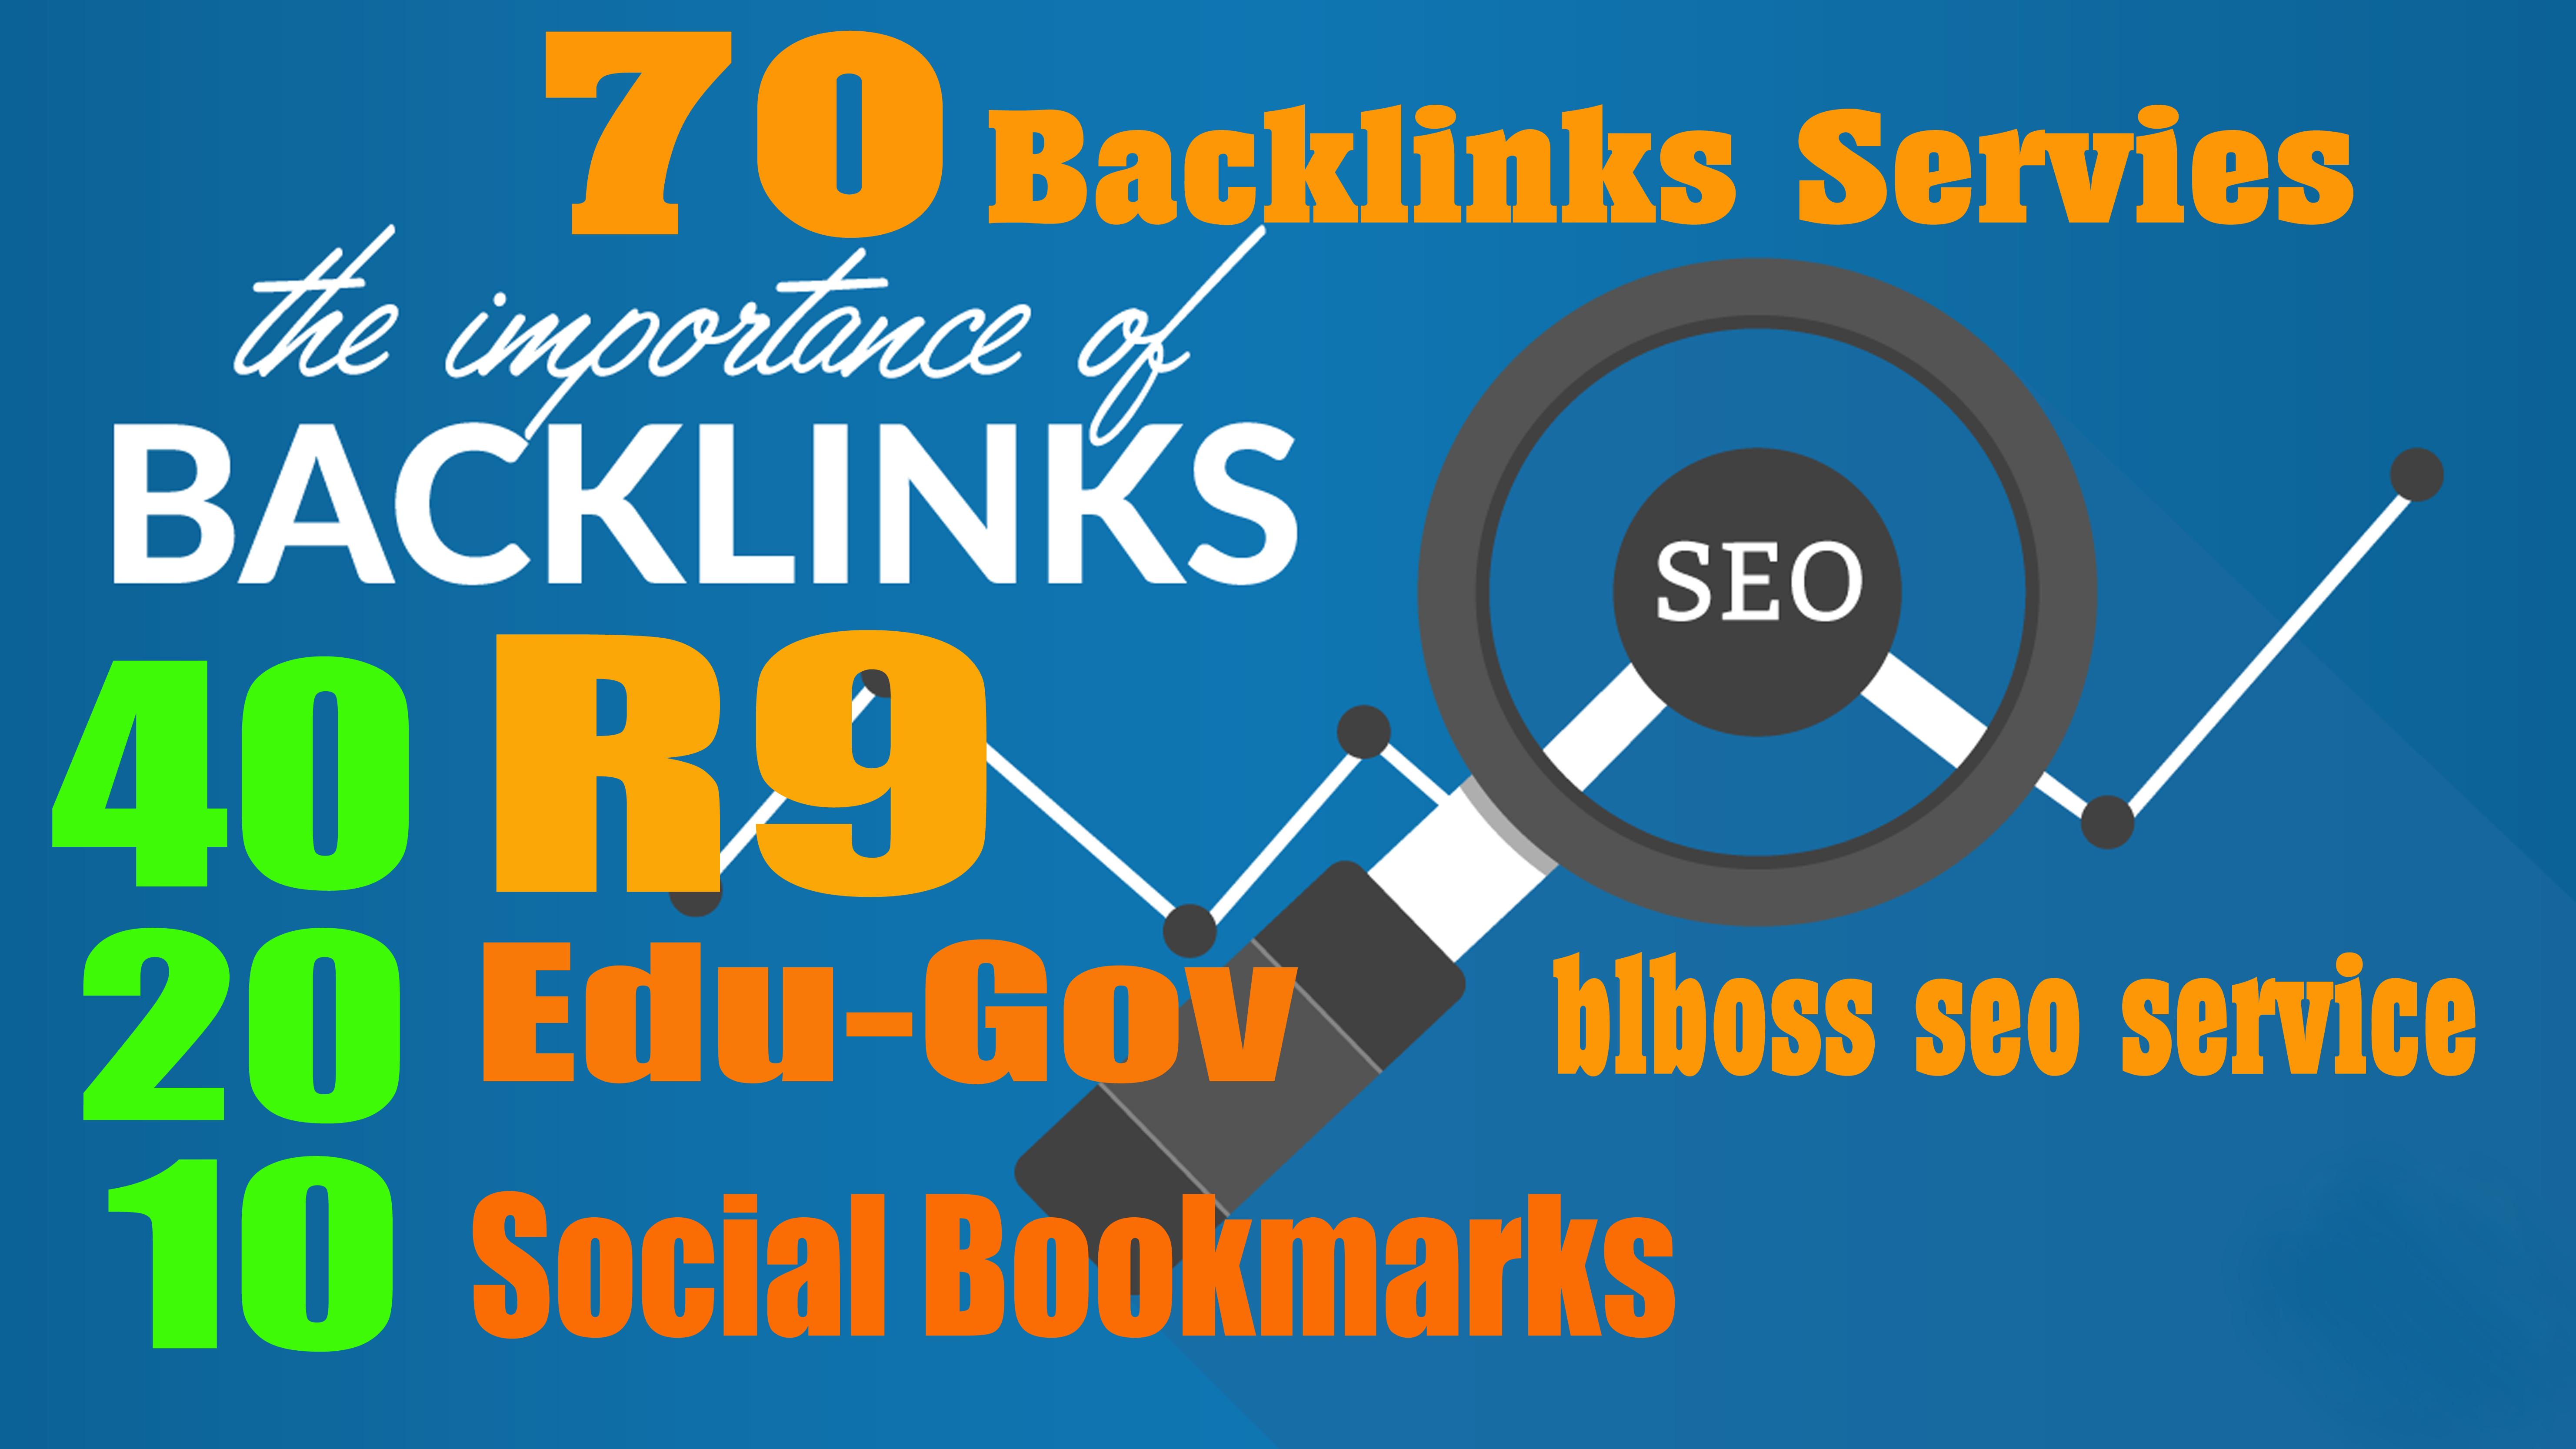 70 Backlinks from 40 PR9 + 20 EDU-GOV + 10 SOCIAL BOO...